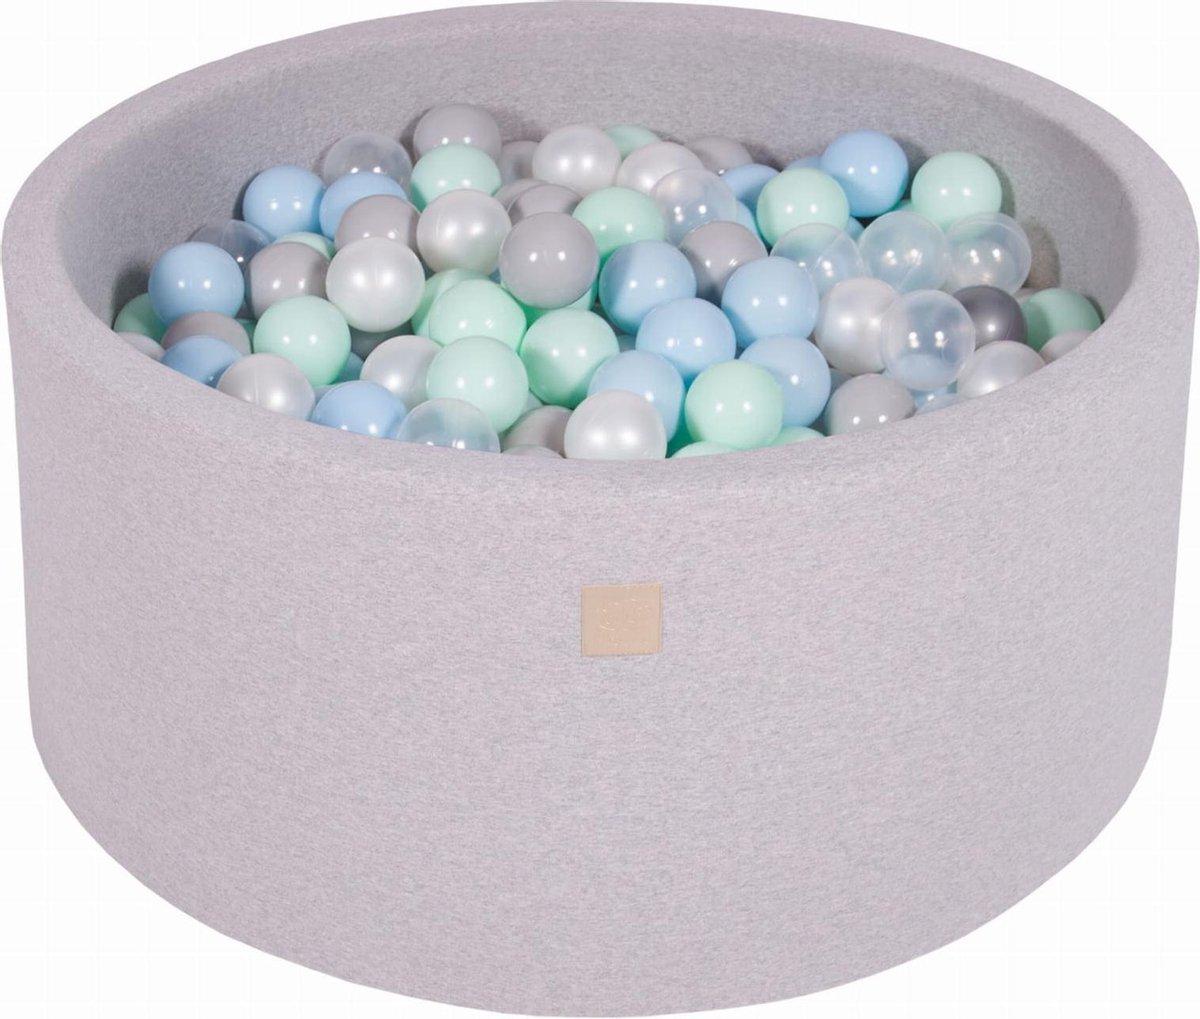 Ronde Ballenbak set incl 300 ballen 90x40cm - Licht Grijs: Parel Wit, Grijs, Transparant, Mint, Babyblauw